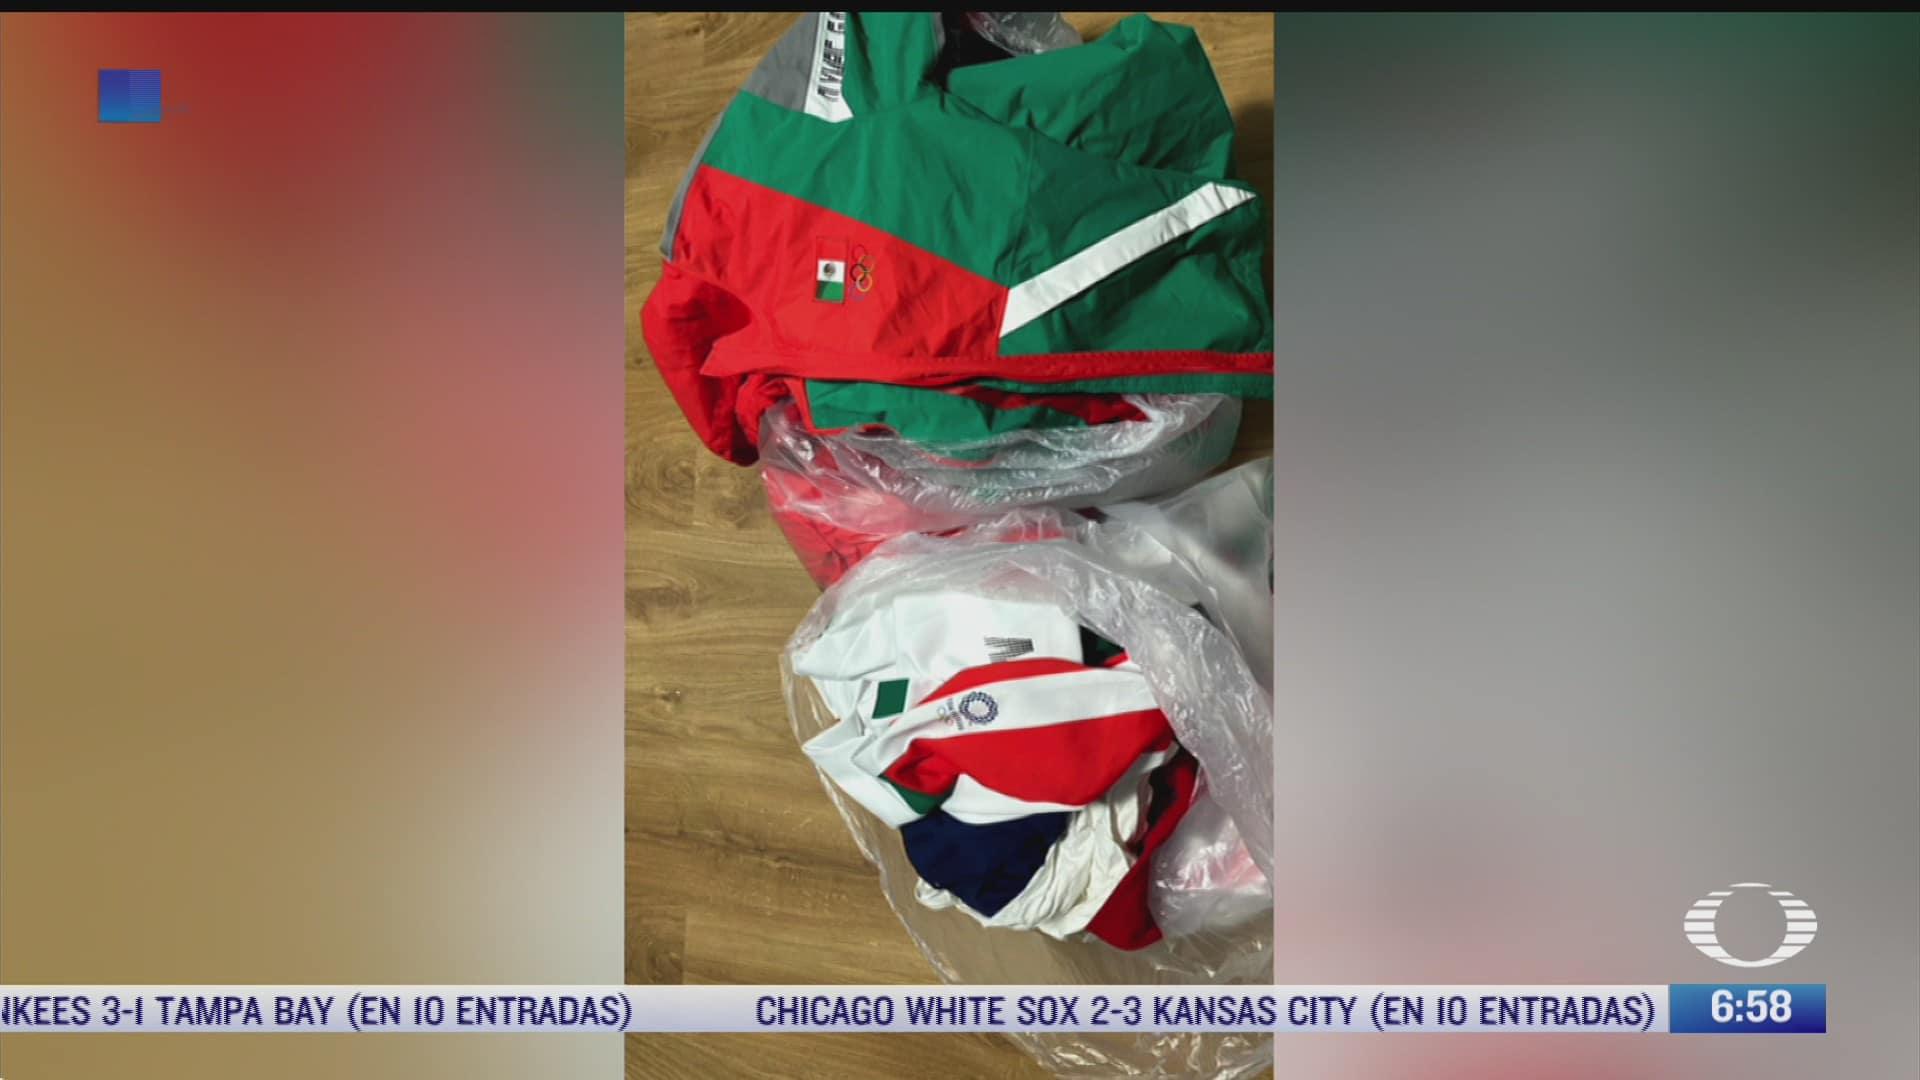 equipo de softbol mexicano tira sus uniformes de tokyo 2020 a la basura